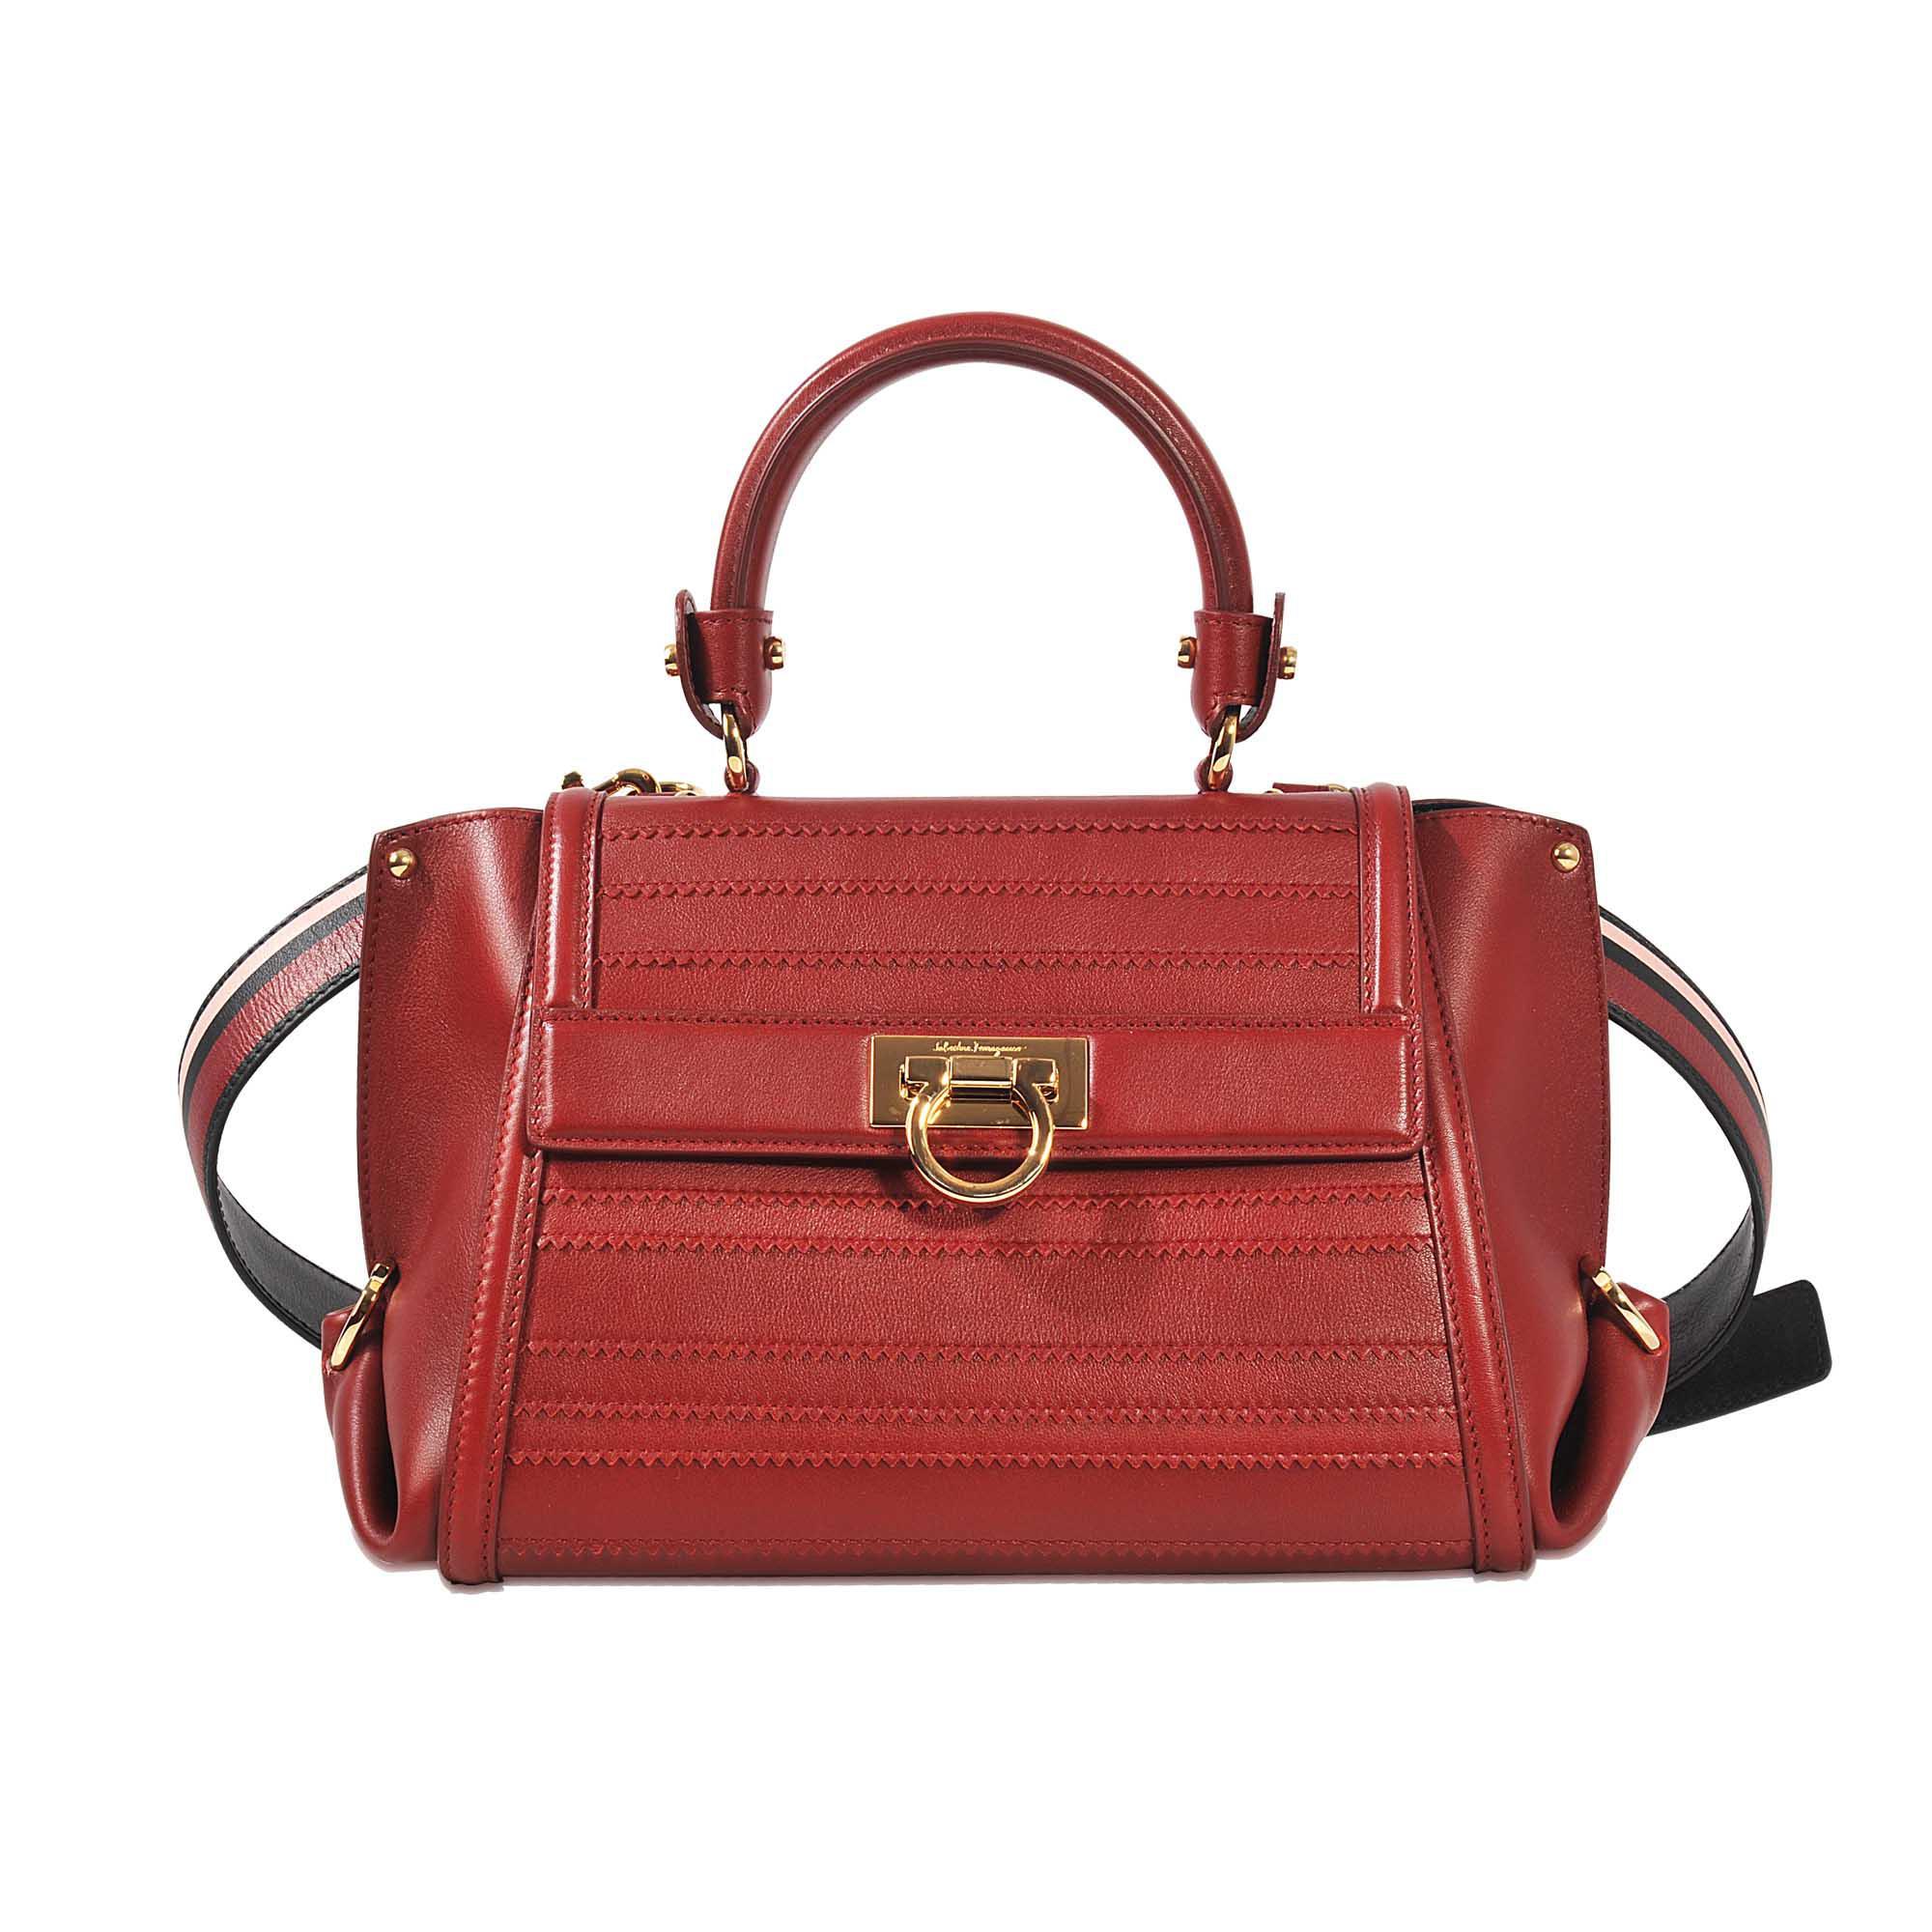 4d1a73108df5 Ferragamo Sofia Small Stitched Bag in Red - Lyst